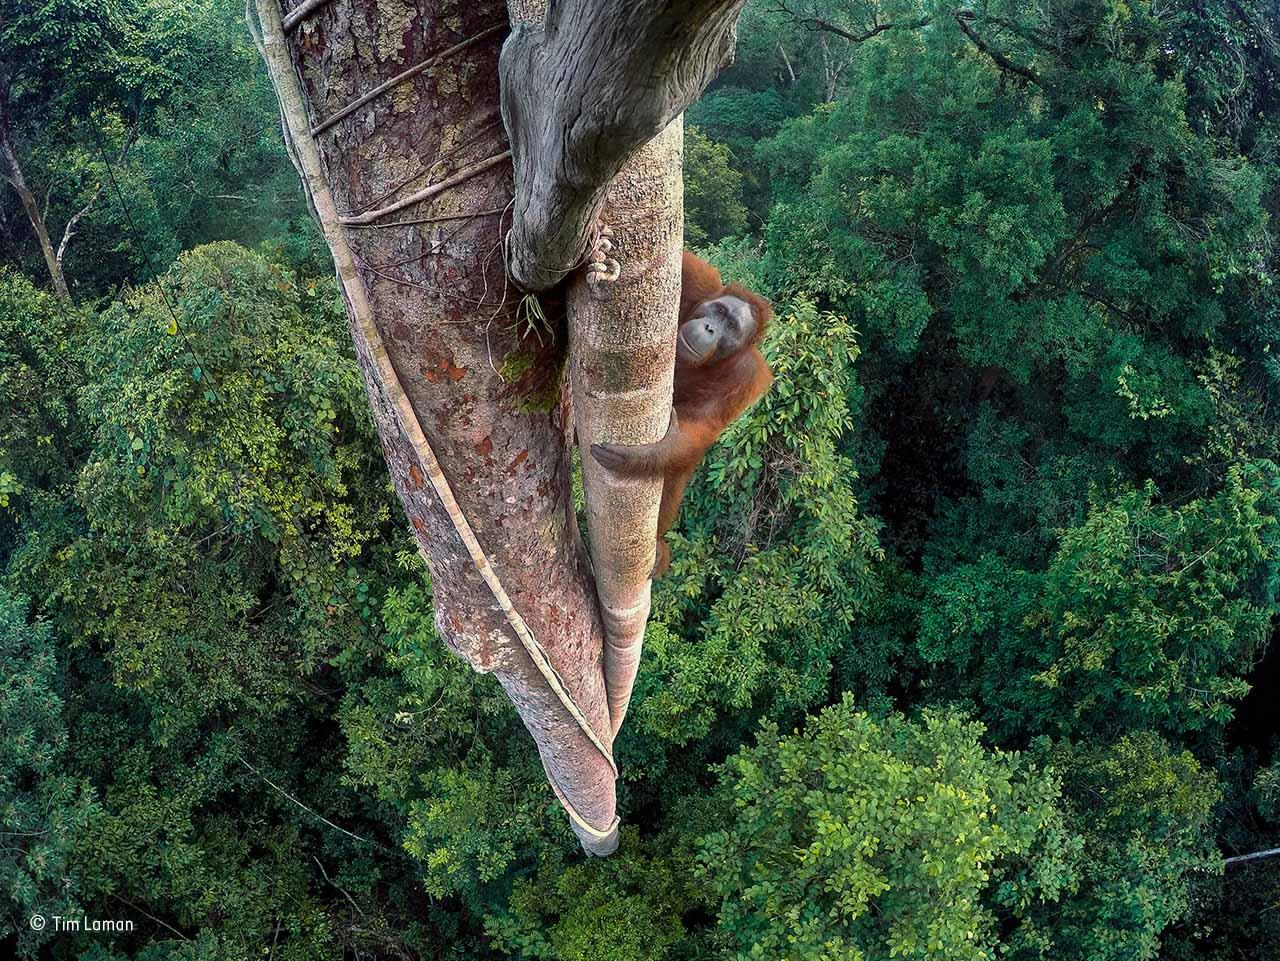 wildlife photographer of the year 2016 winners